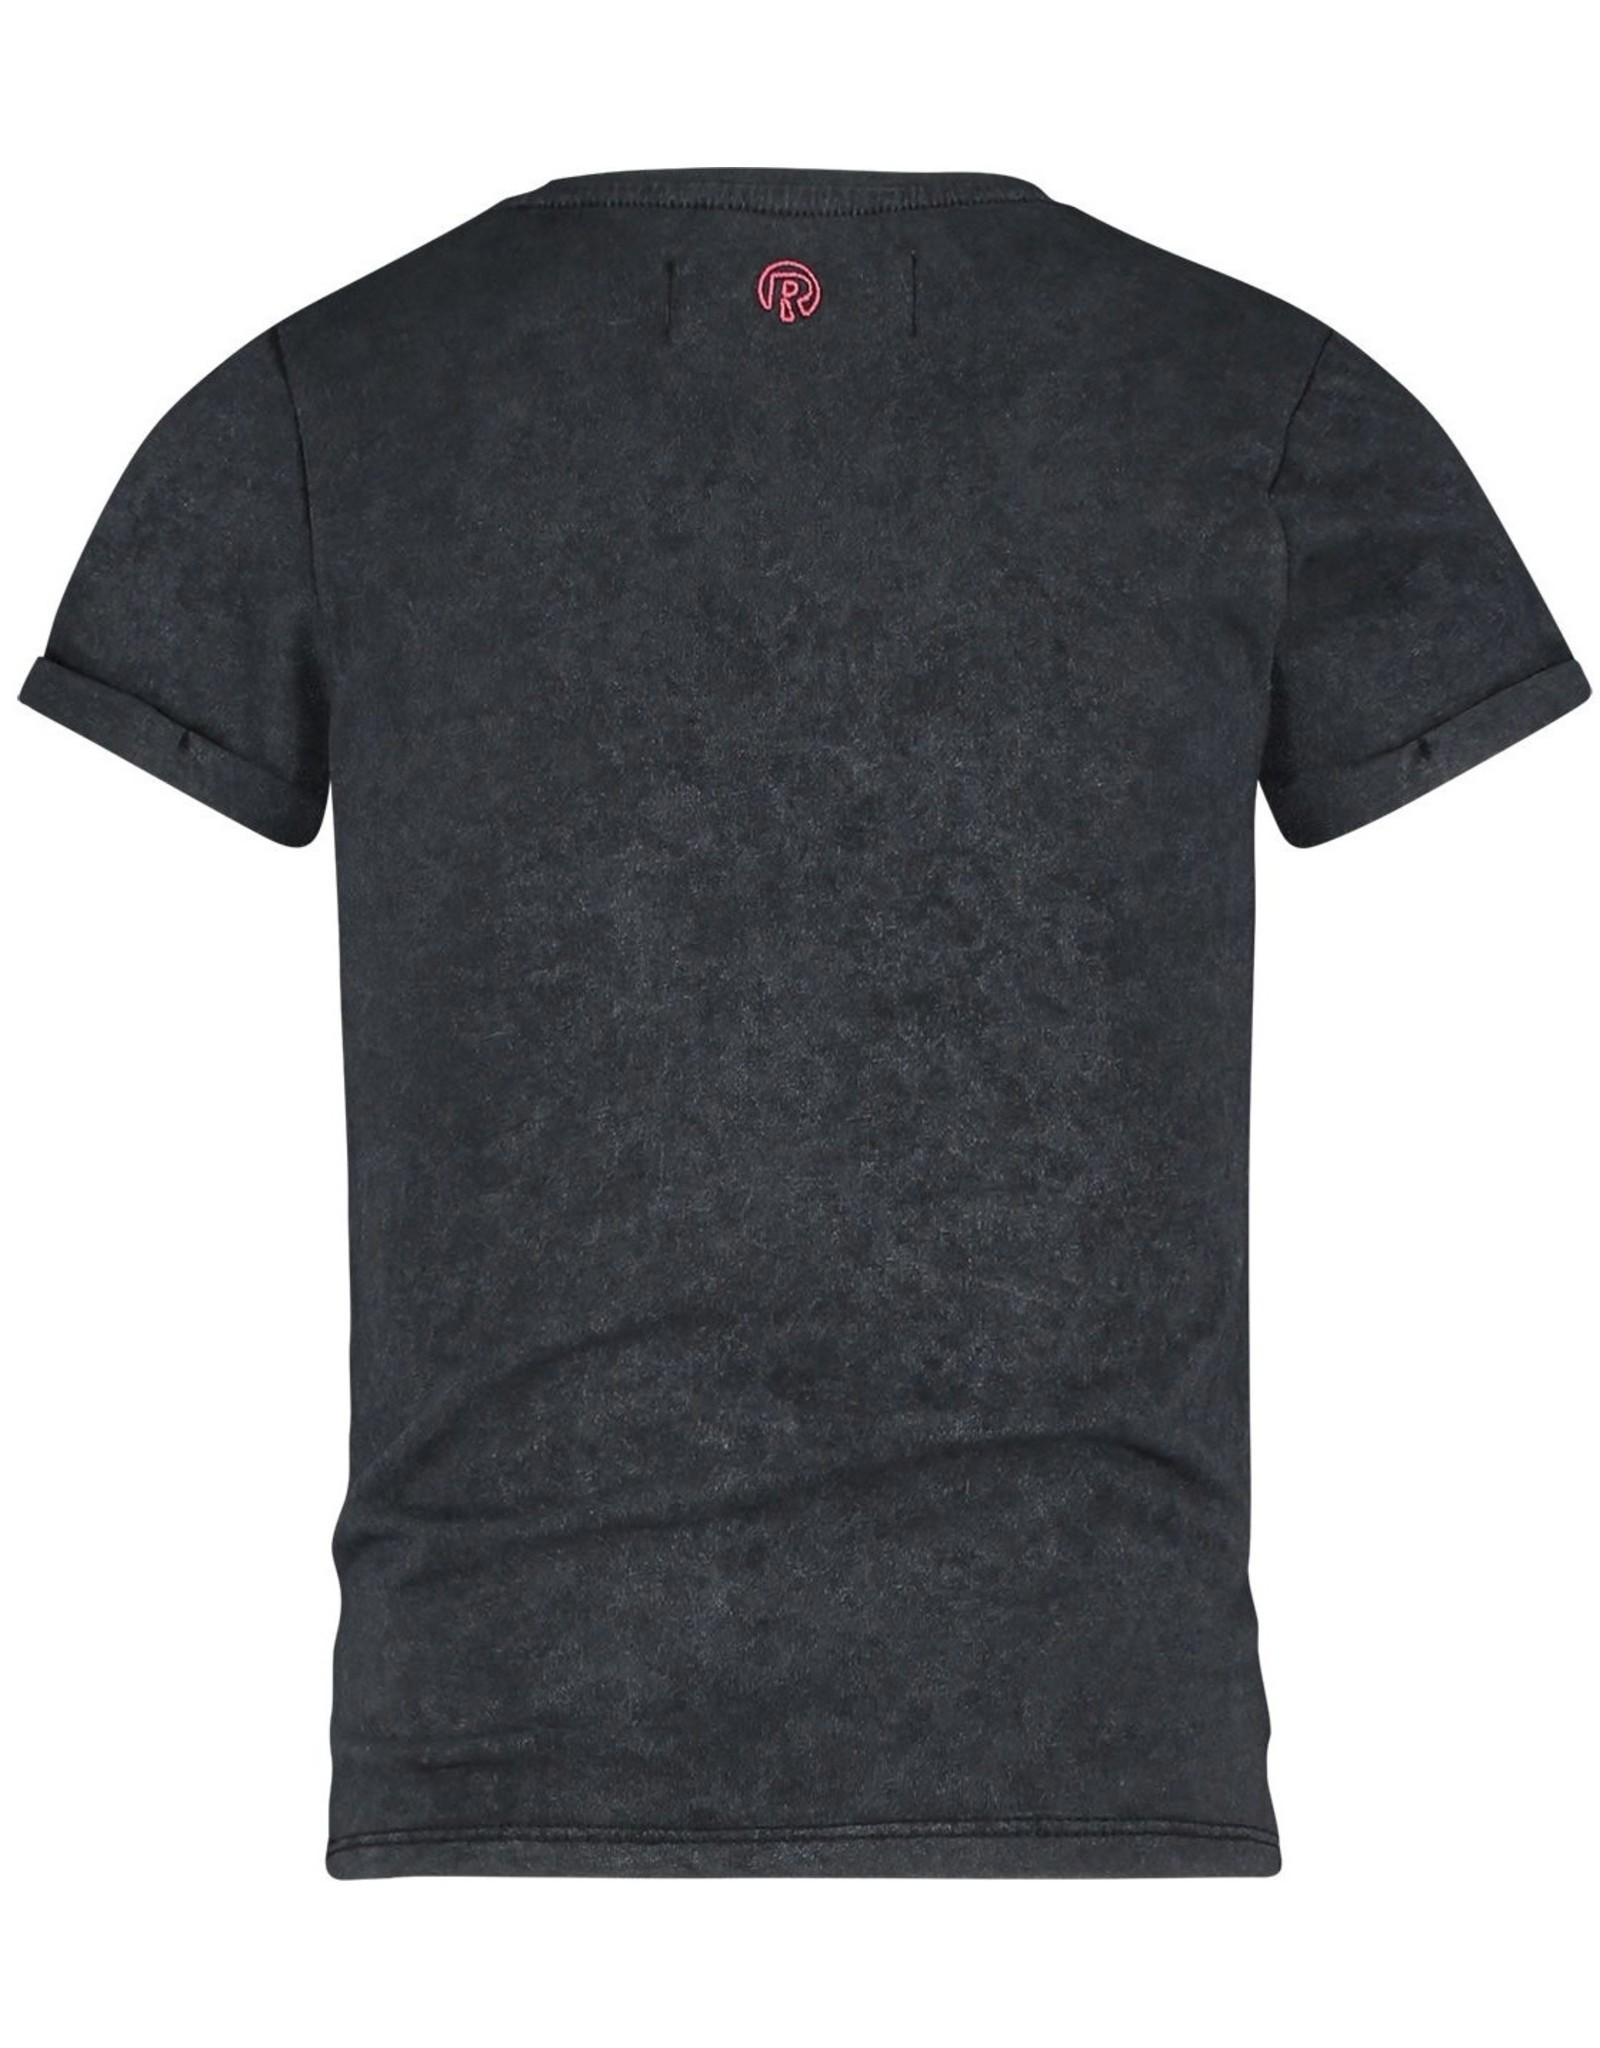 Raizzed Kyoto T-shirt